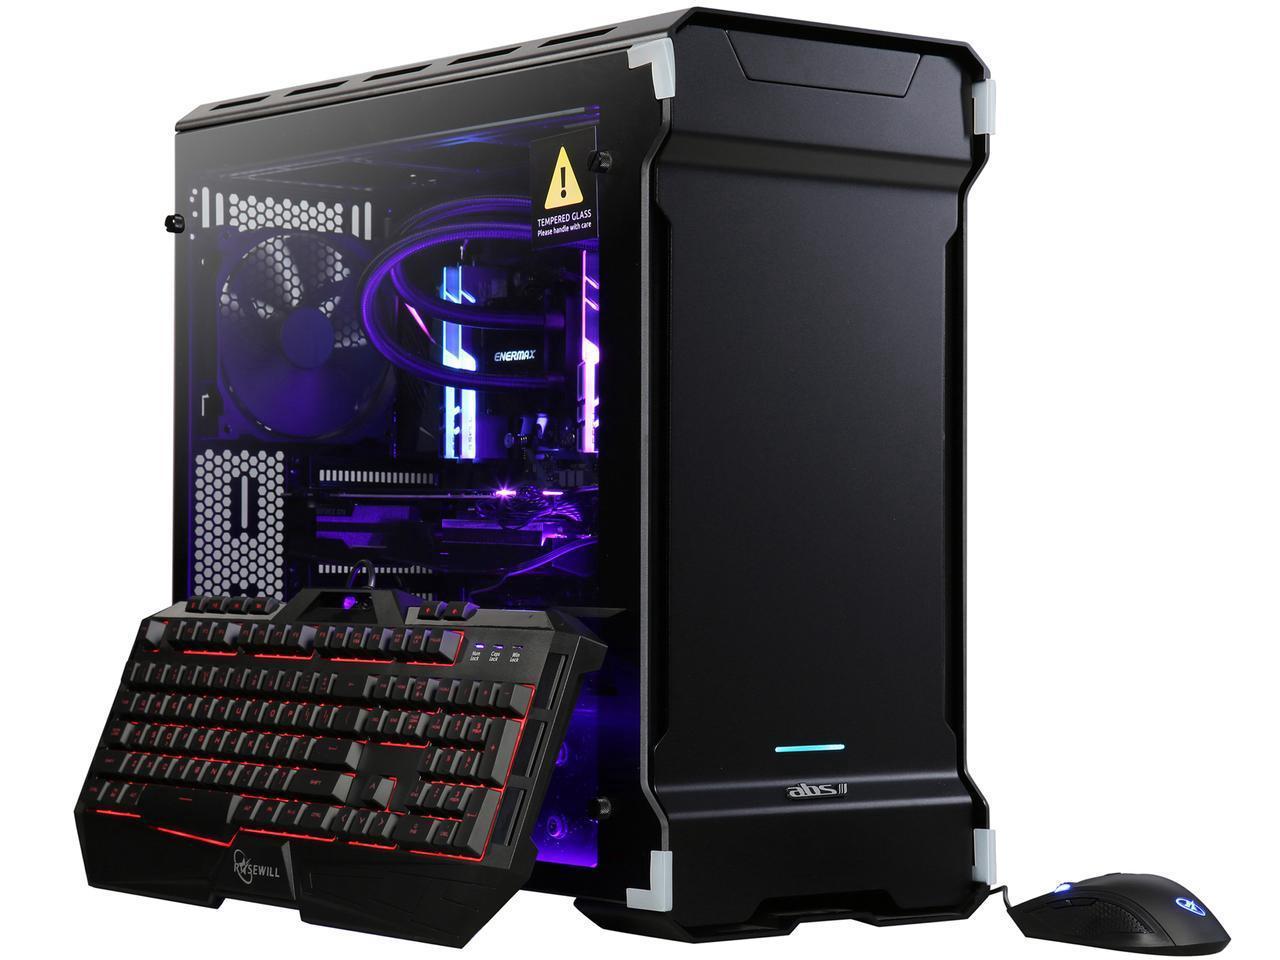 ABS TRipper V2 AMD Radeon RX Vega 64 8 GB AMD Ryzen Threadripper 2990WX (3.00 GHz) 32-Core Liquid Cooling (240 mm) 32 GB DDR4 512 GB NVMe M.2 SSD 2 TB HDD Windows 10 Home 64-Bit ALA091